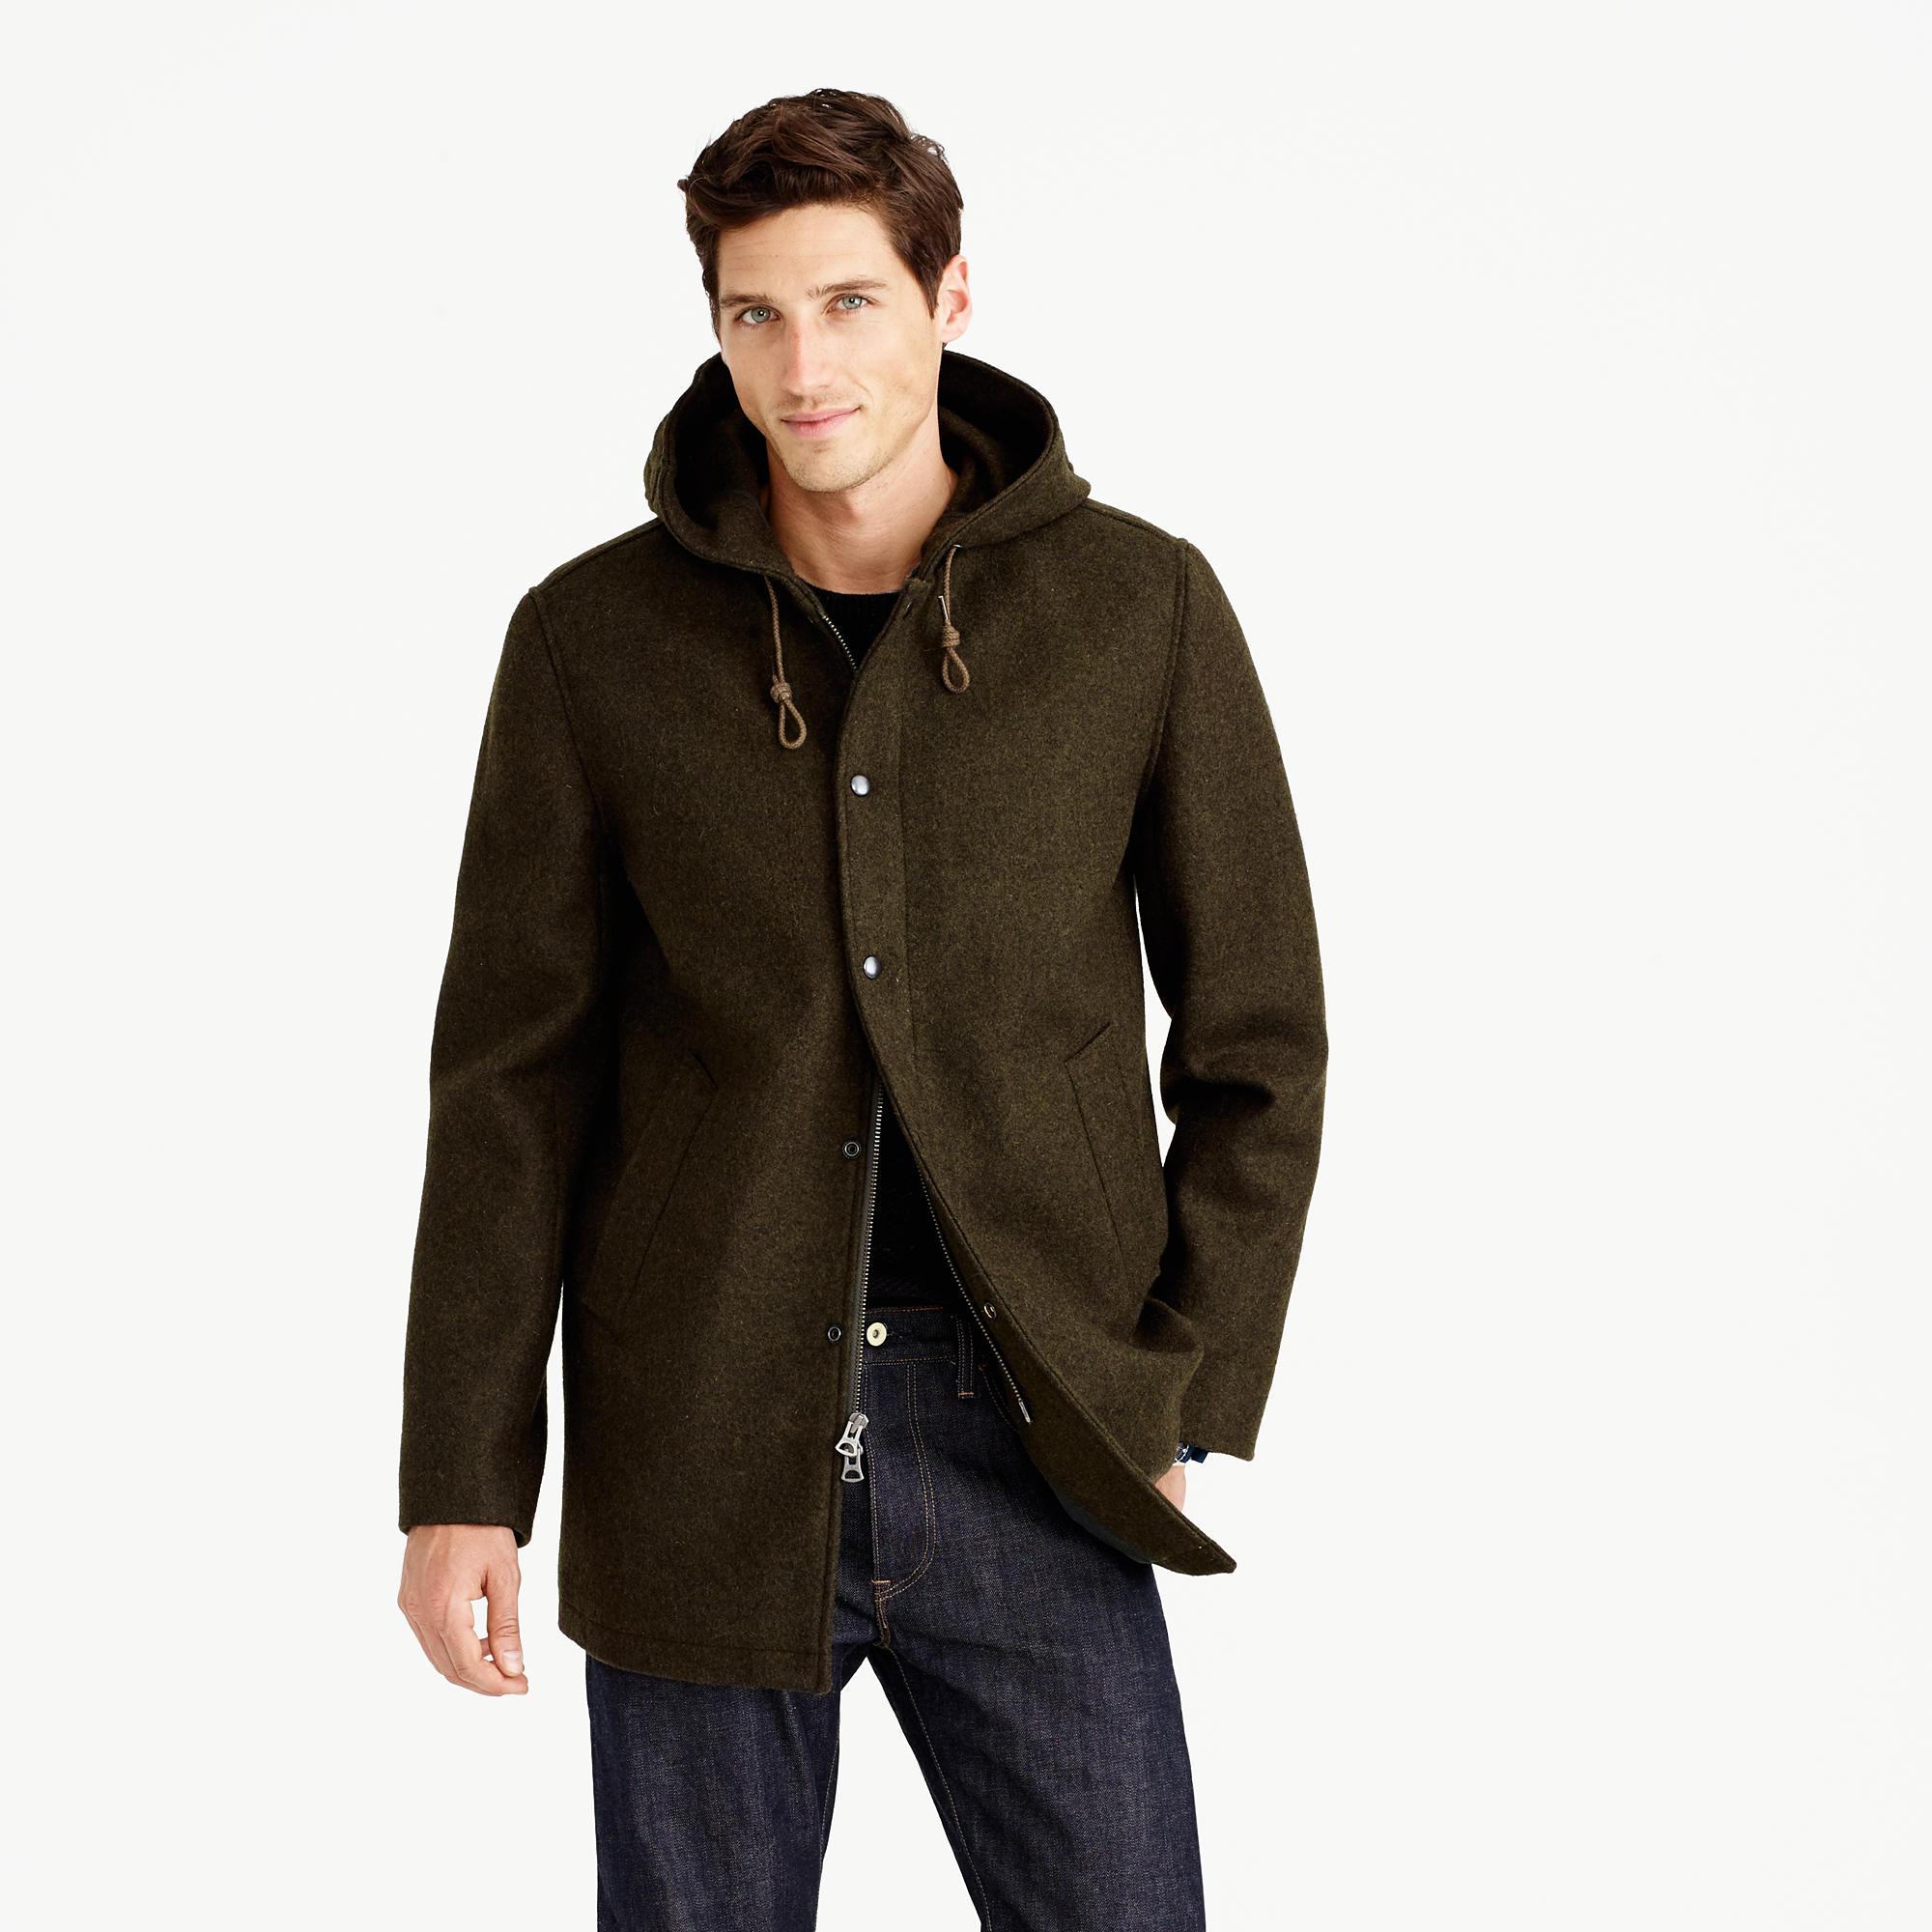 Men's Wool Jackets & Coats : Men's Outerwear | J.Crew